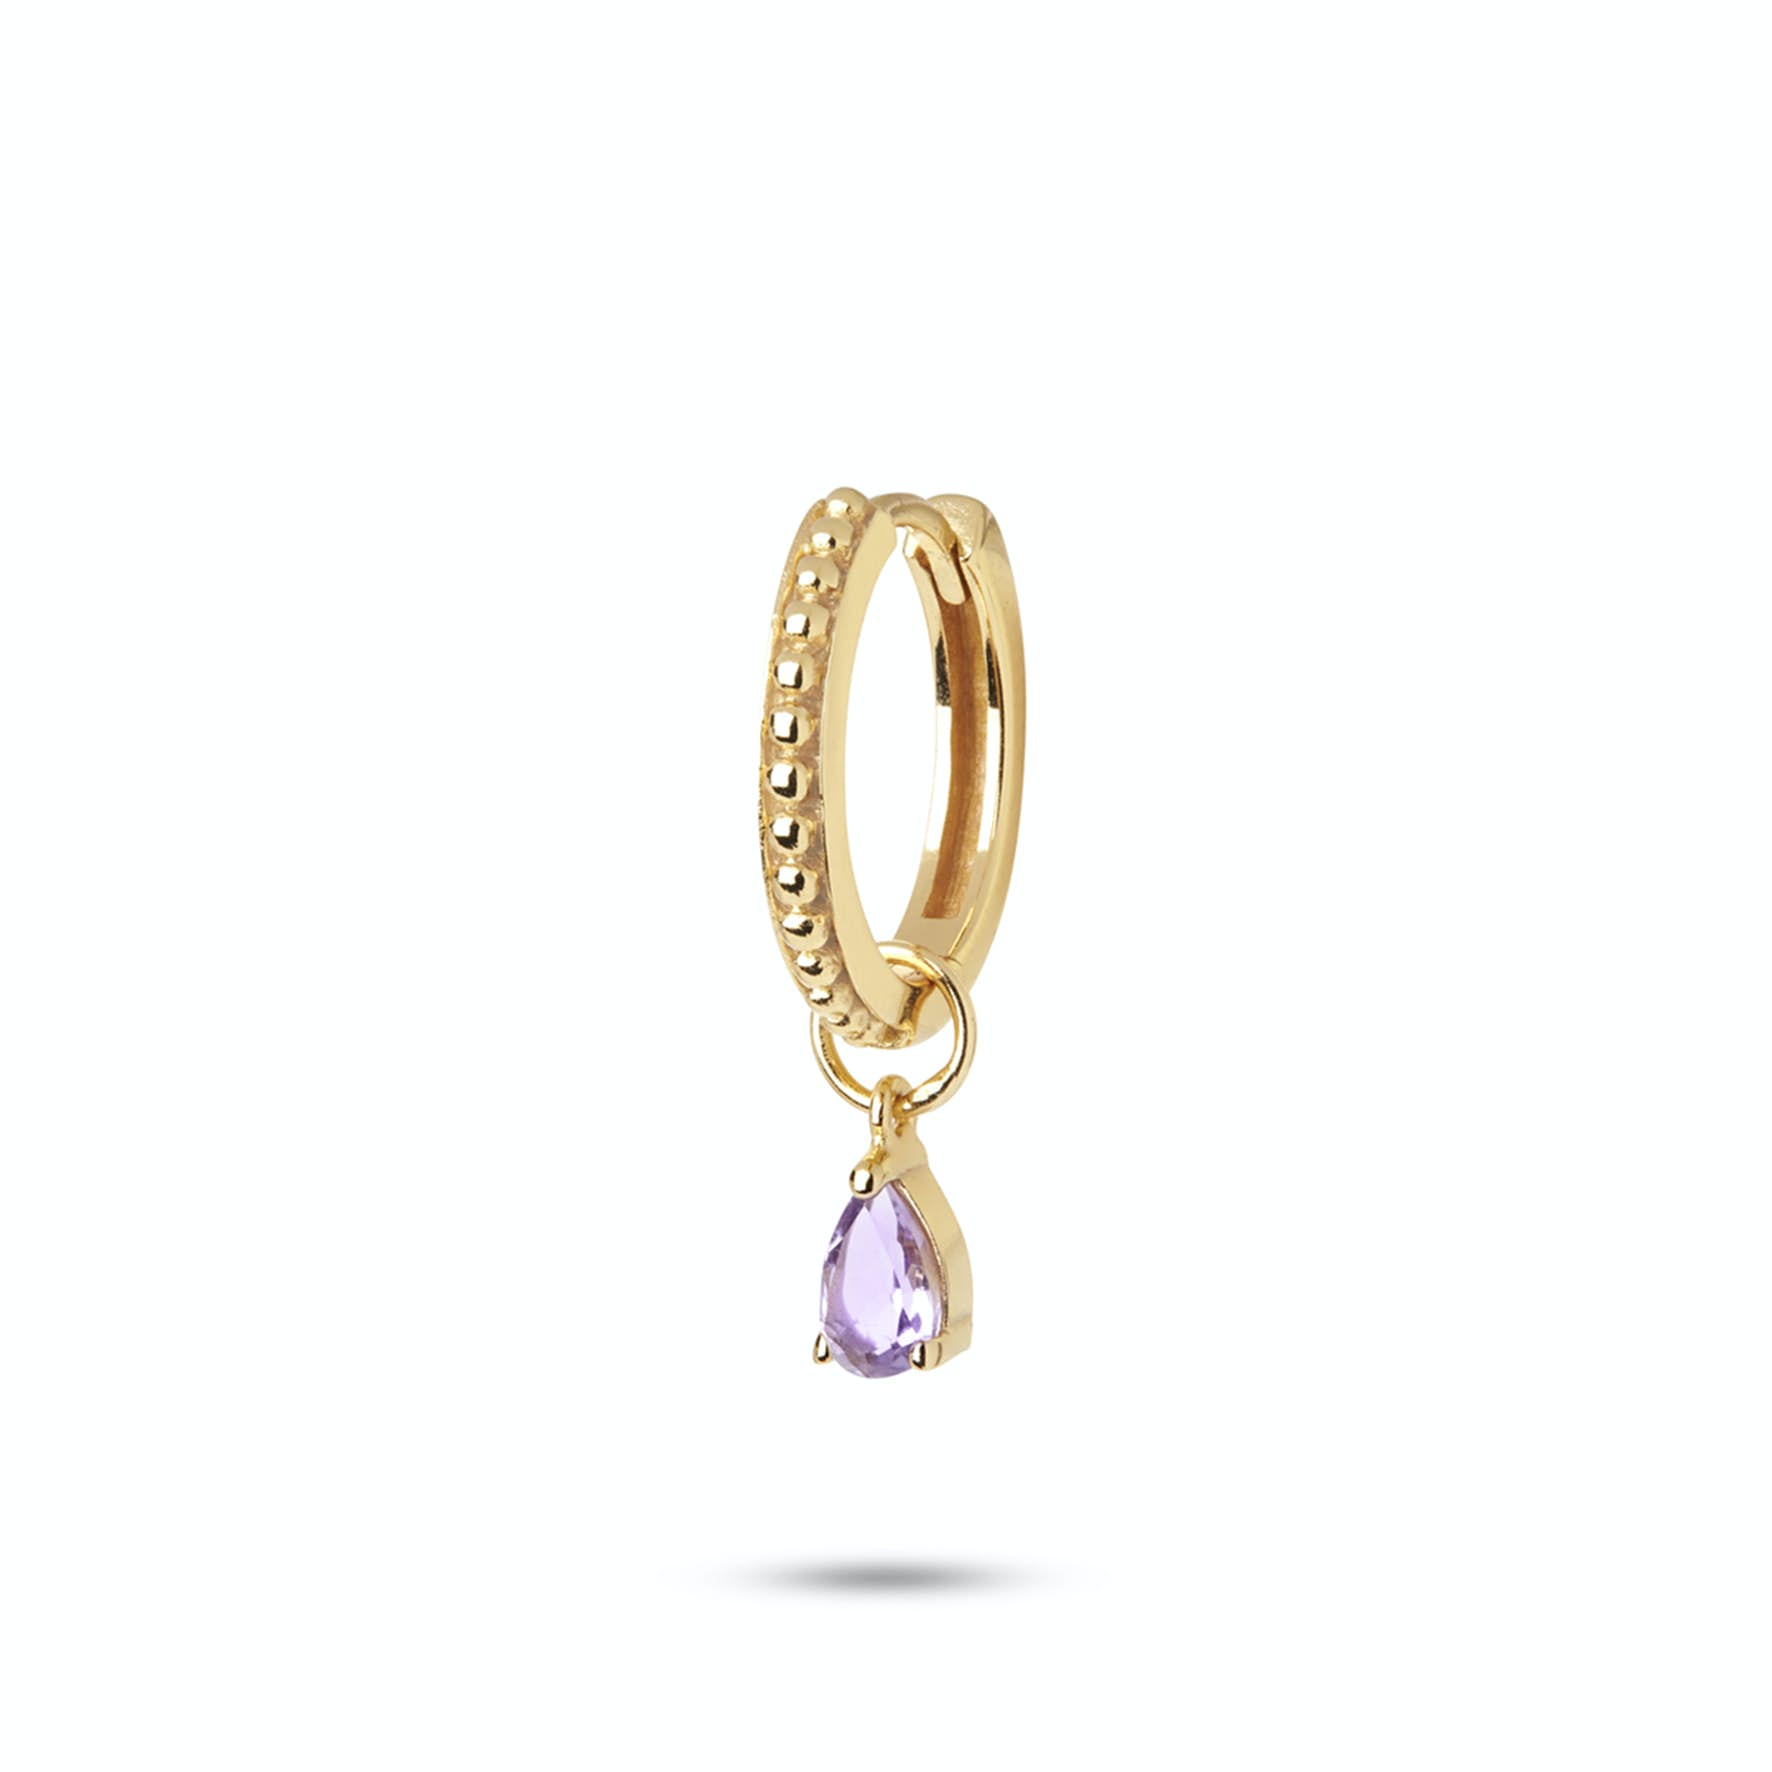 Gem Candy Earring Valentine von Carré in Vergoldet-Silber Sterling 925